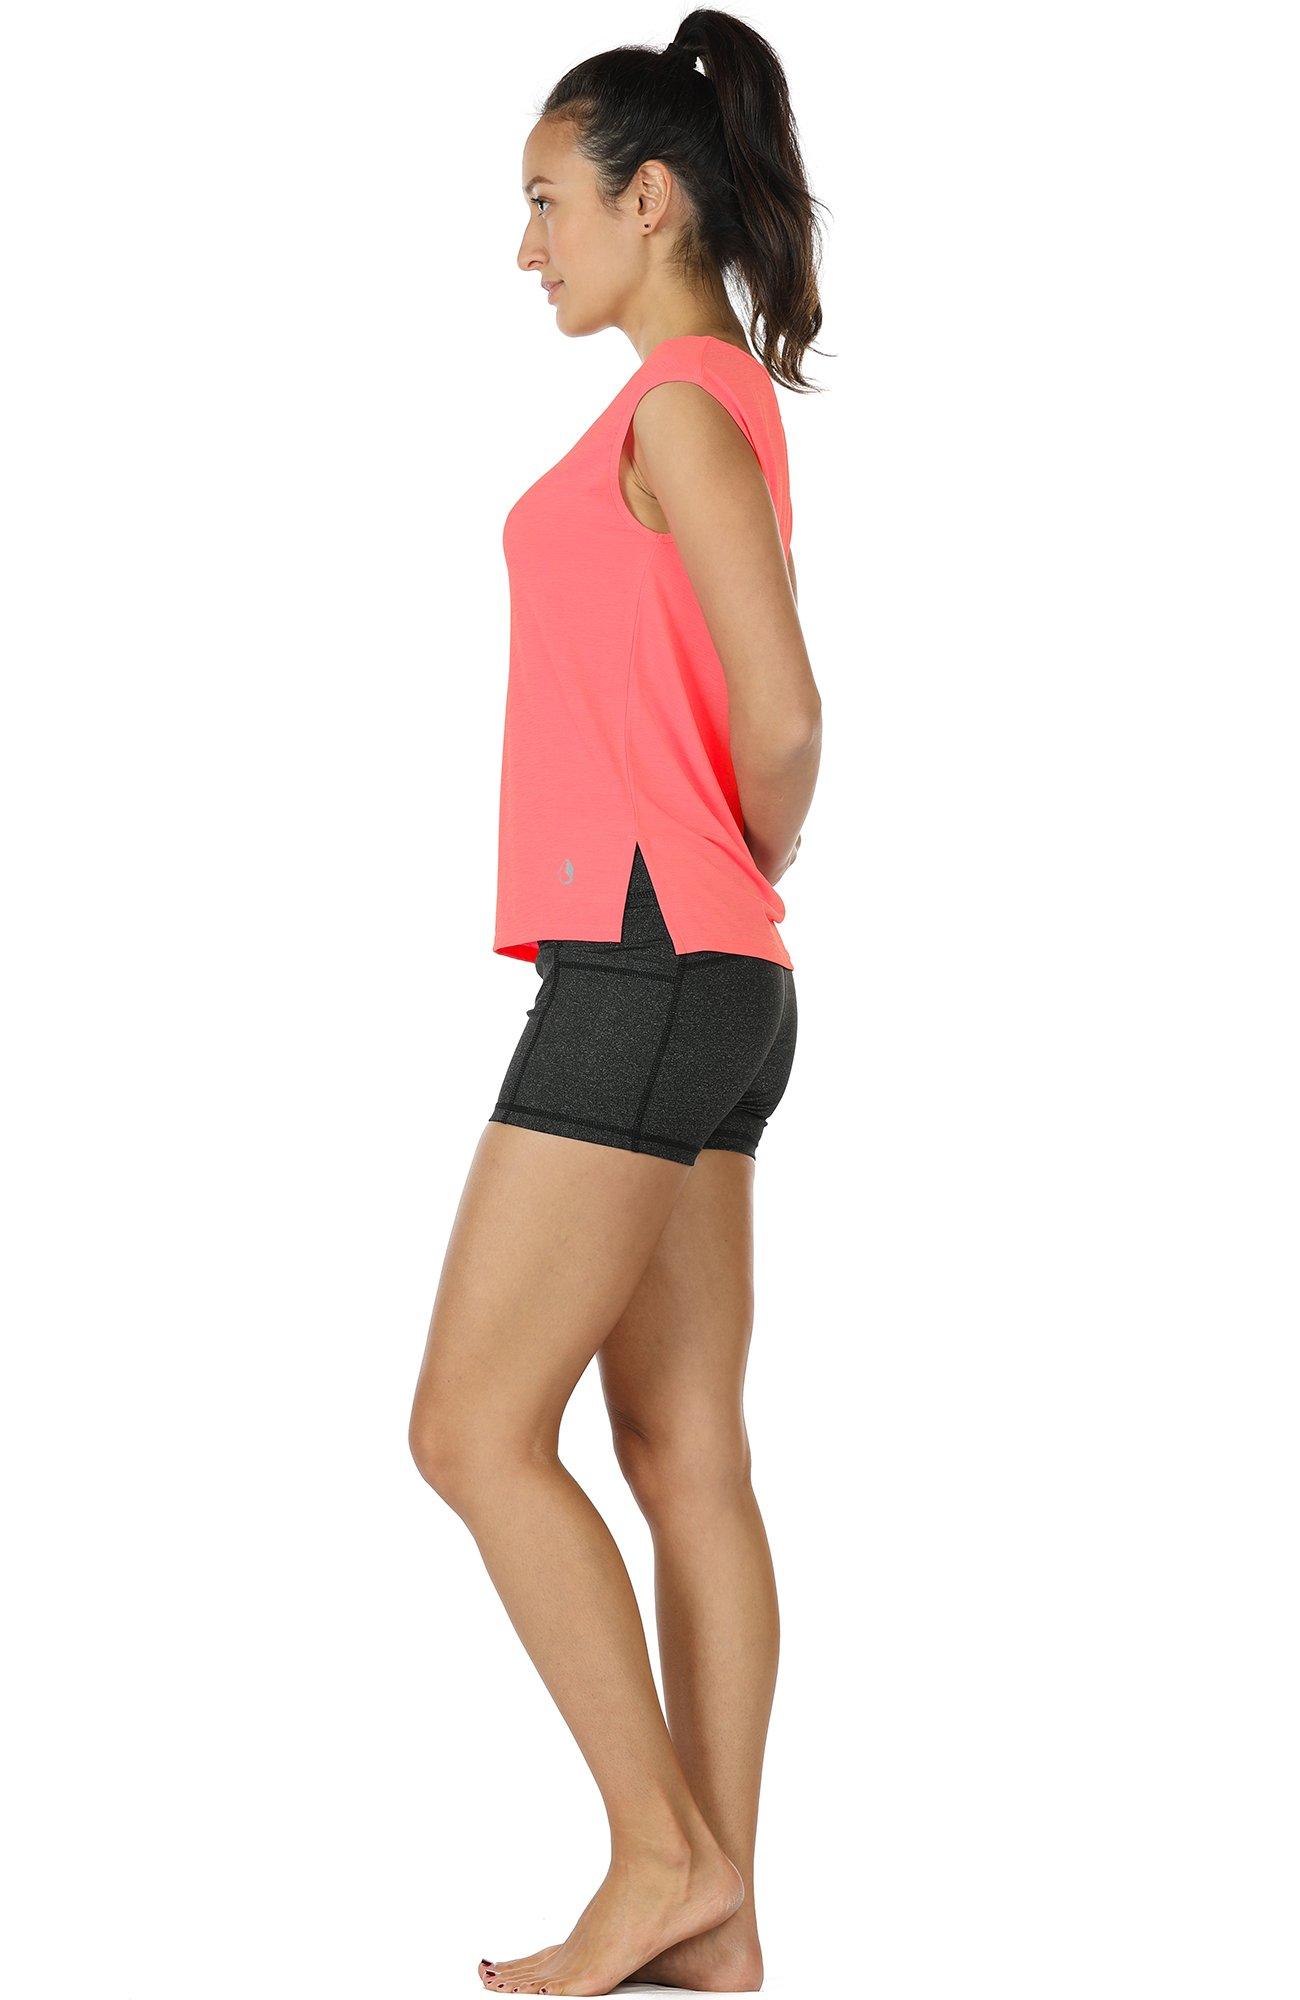 icyZone Yoga Tops Activewear Sleeveless Workout Running Shirts Flowy Tank Tops for Women (M, Mandarin Red)